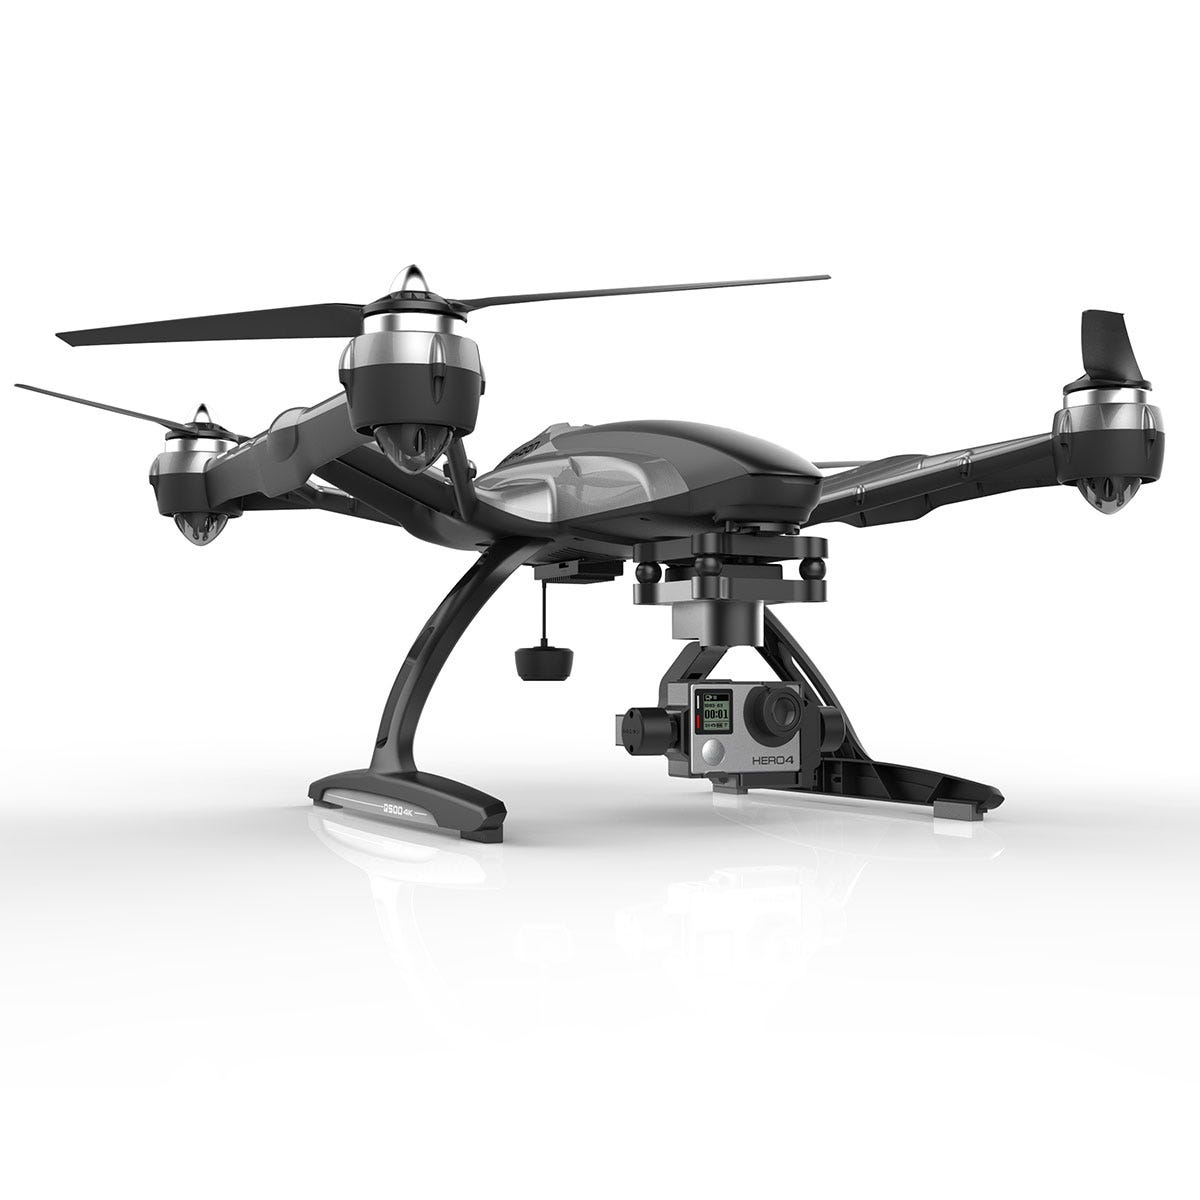 Yuneec Q500 drone quadcopter